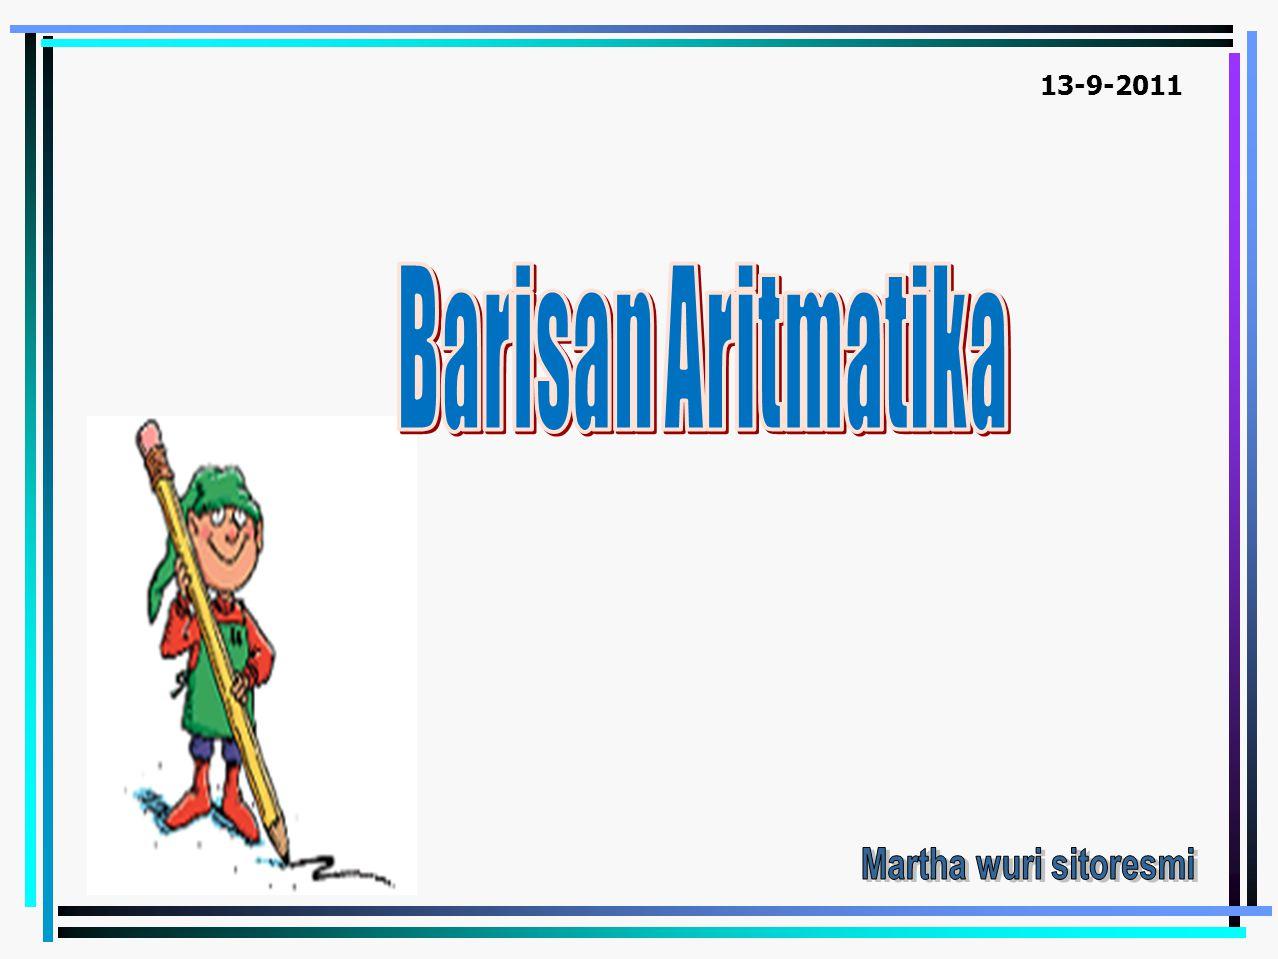 1.Diketahui barisan aritmatika, tentukan 3 suku selanjutnya dan tentukan pula rumusan suku ke - n a.